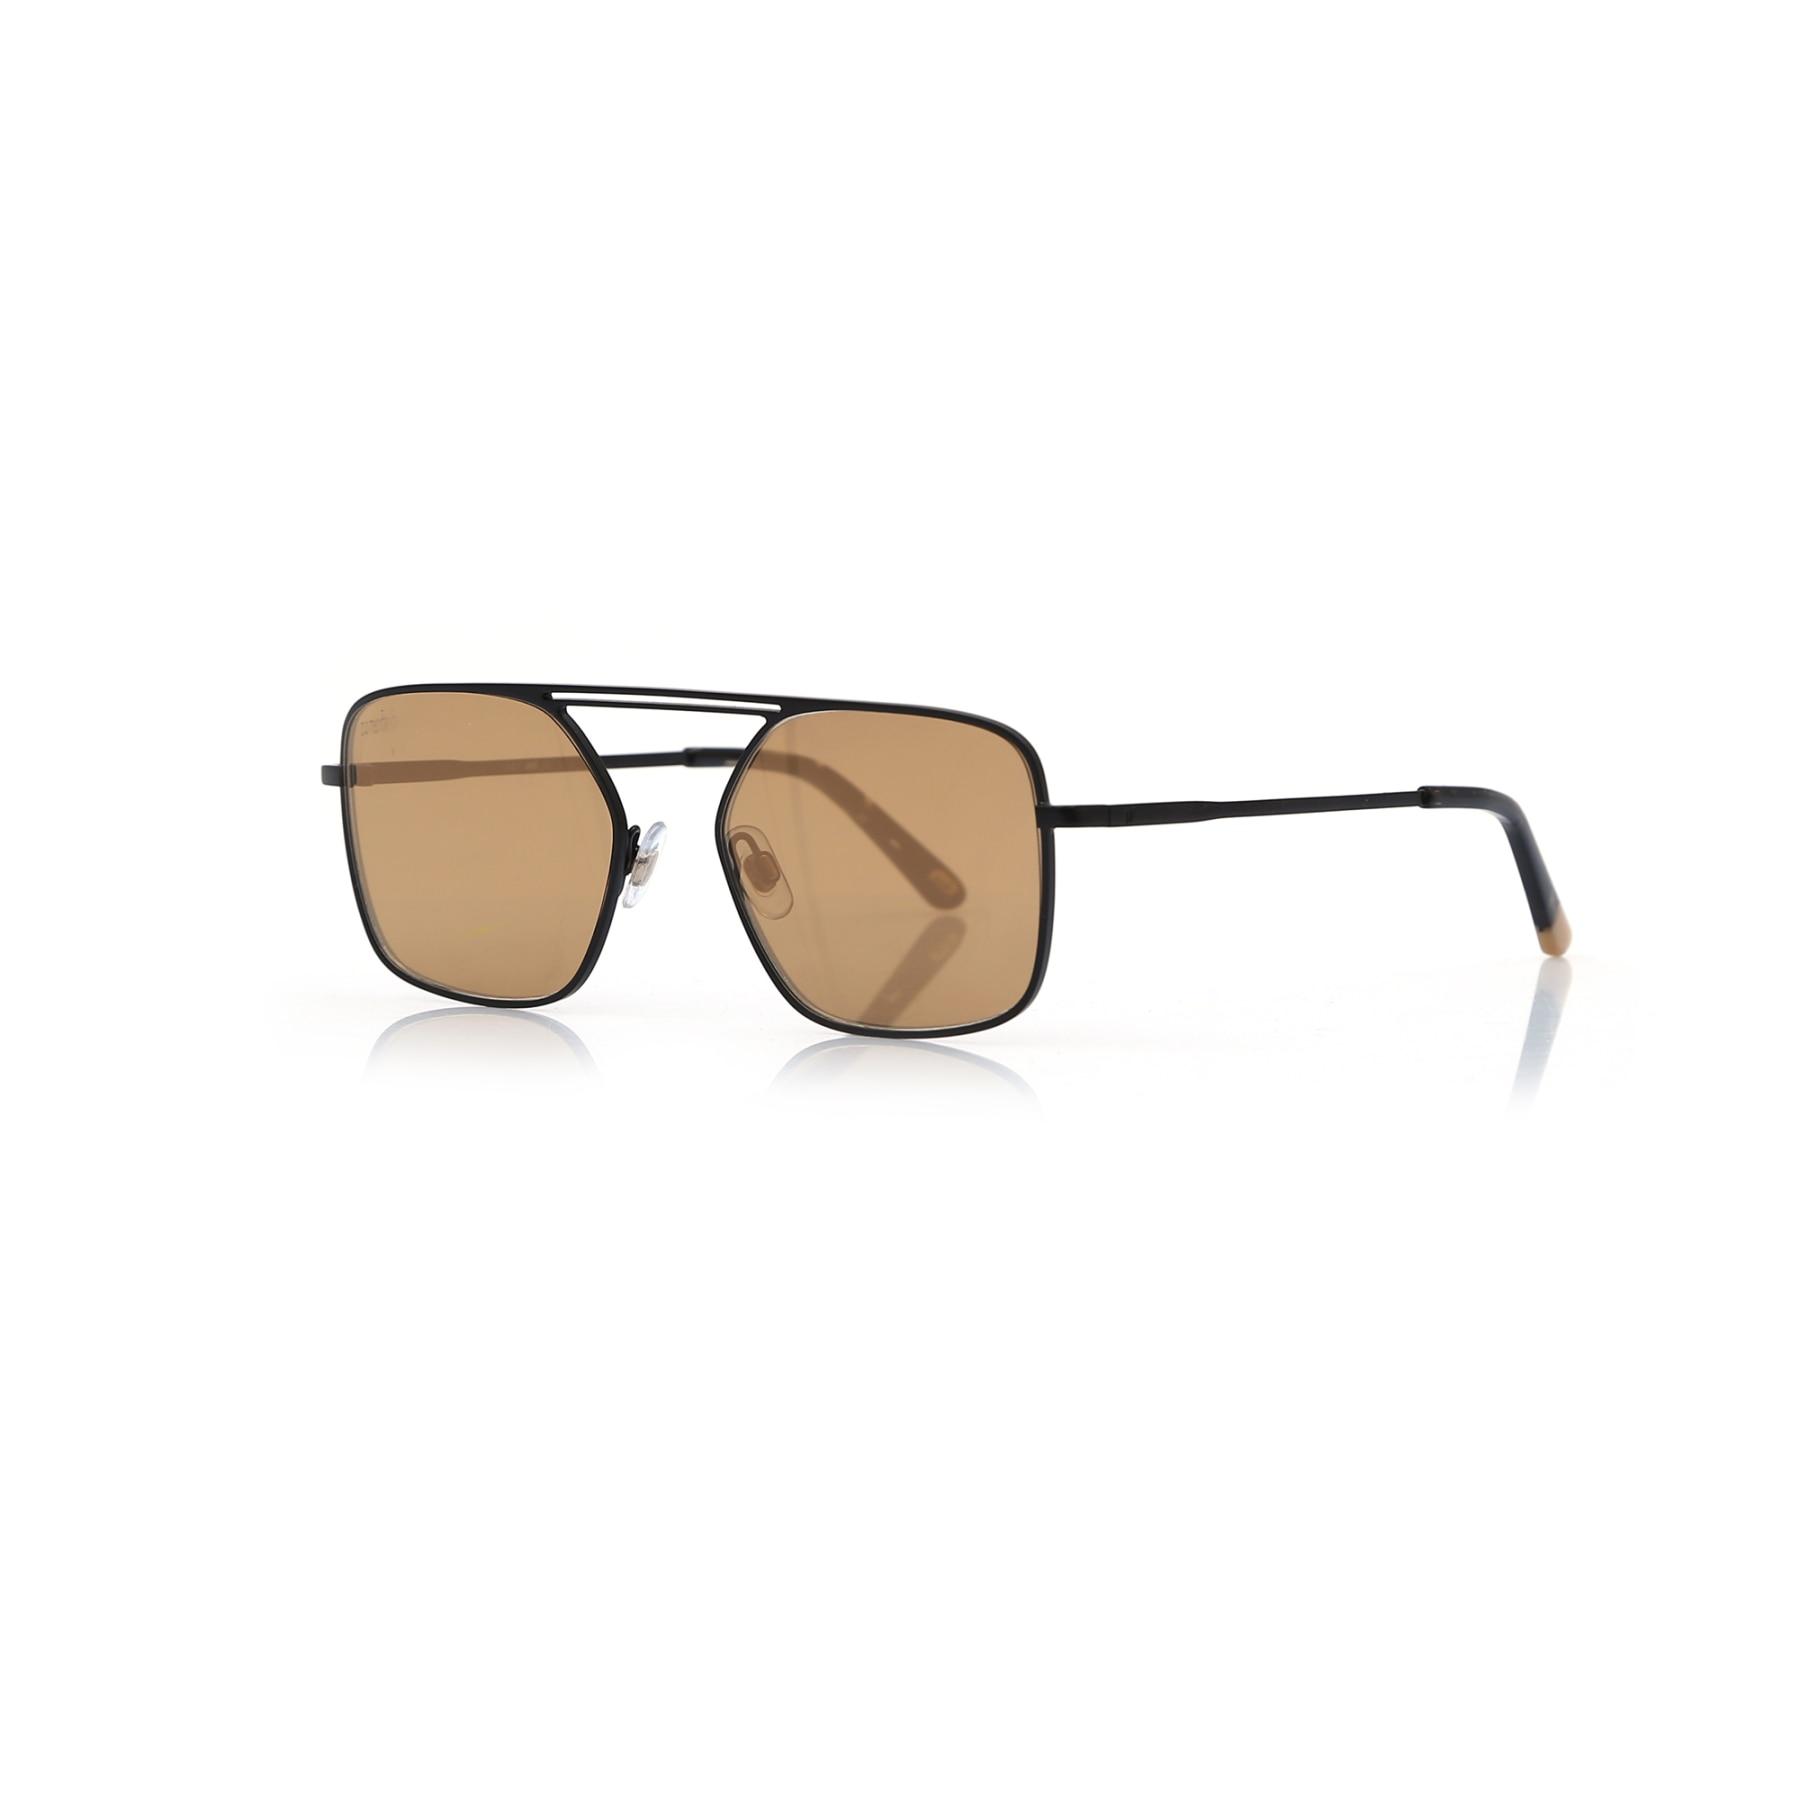 Men's sunglasses w 0209 02g metal black organic square square 53-18-145 web